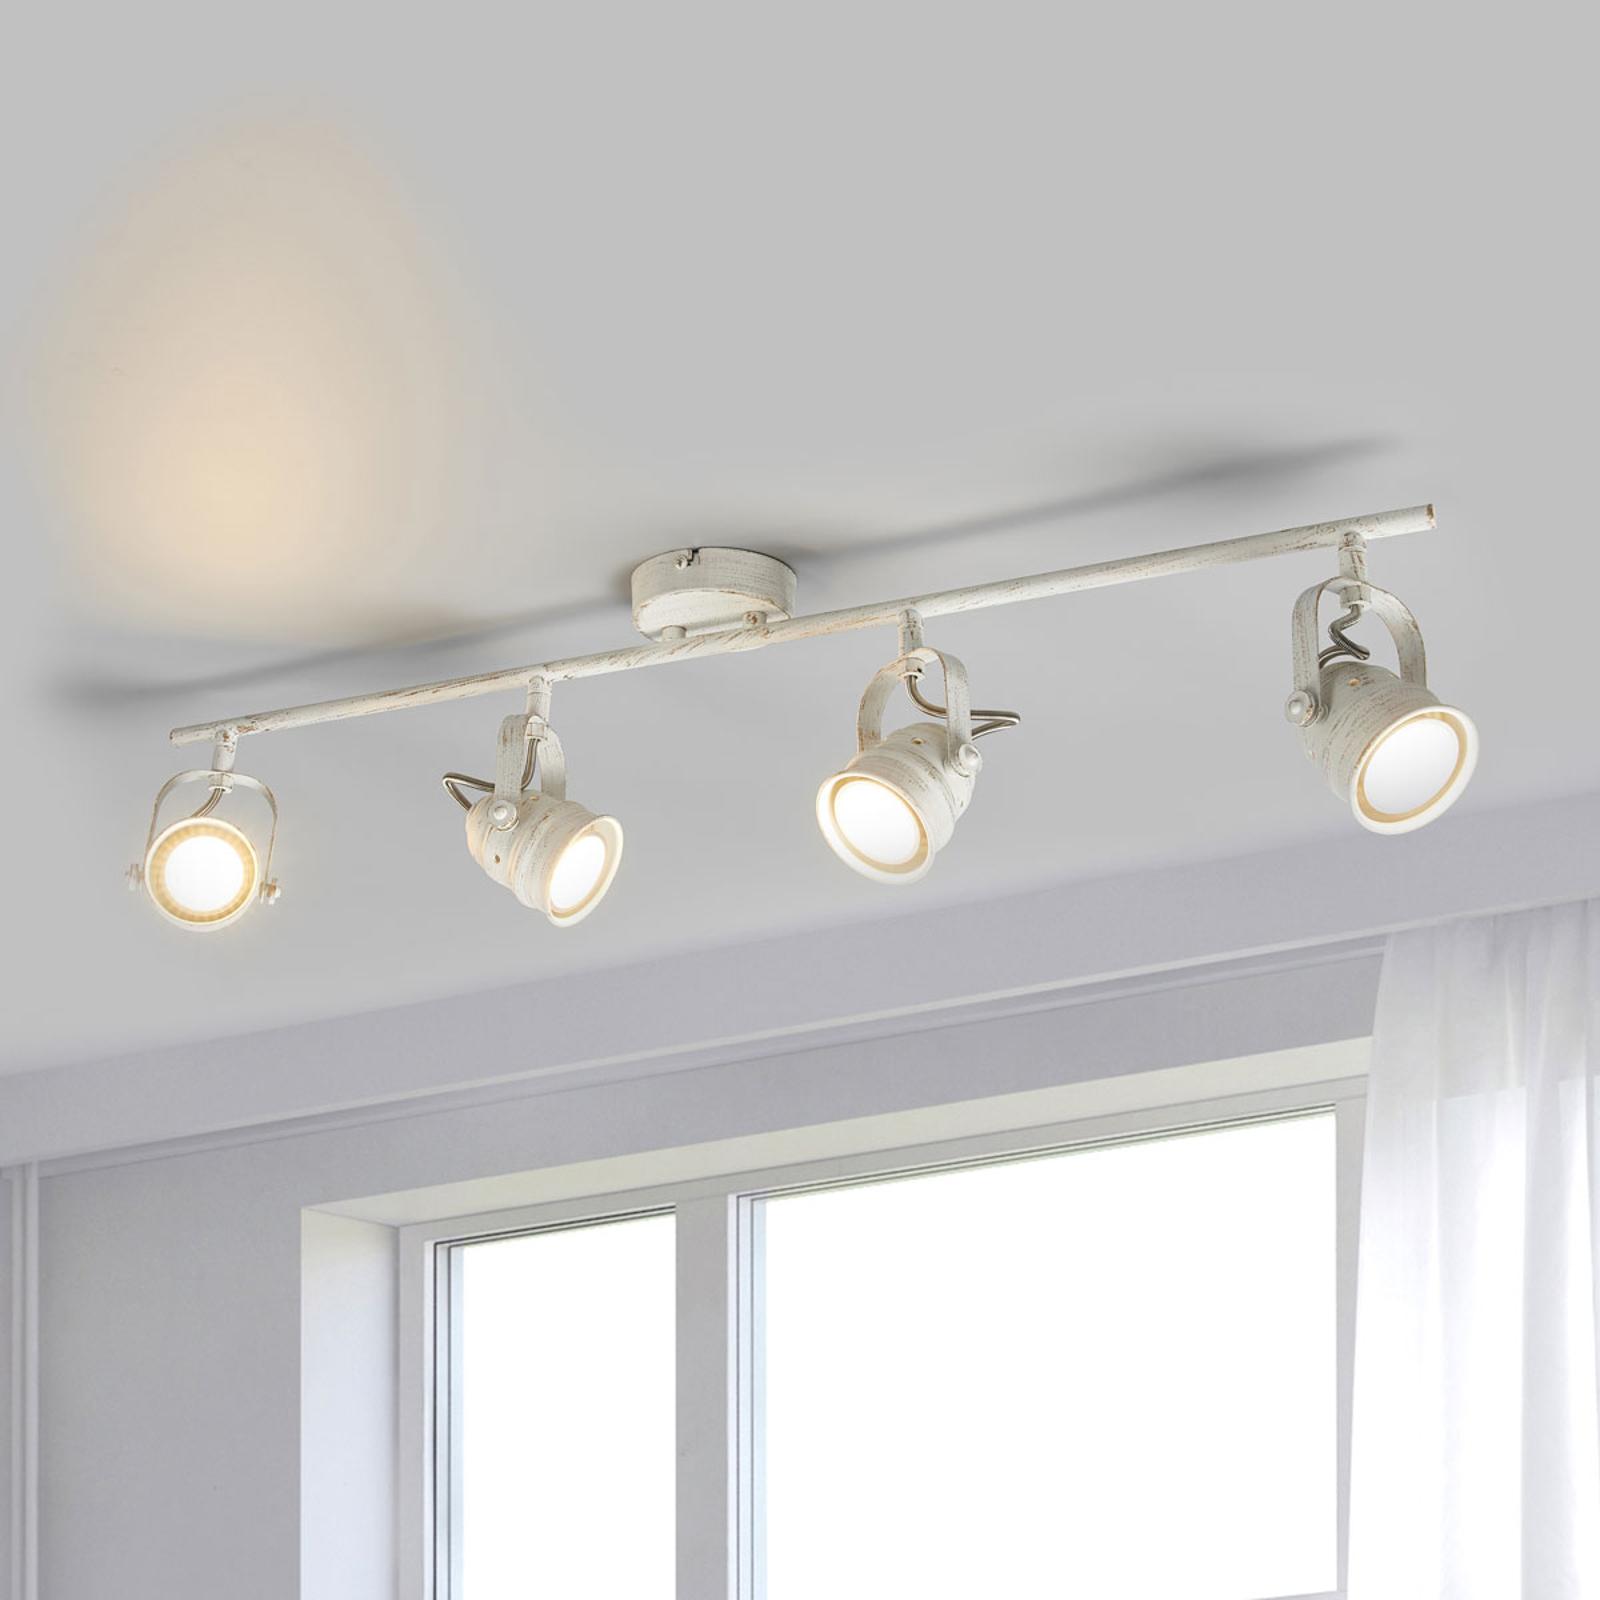 Biała lampa sufitowa LED Leonor, GU10